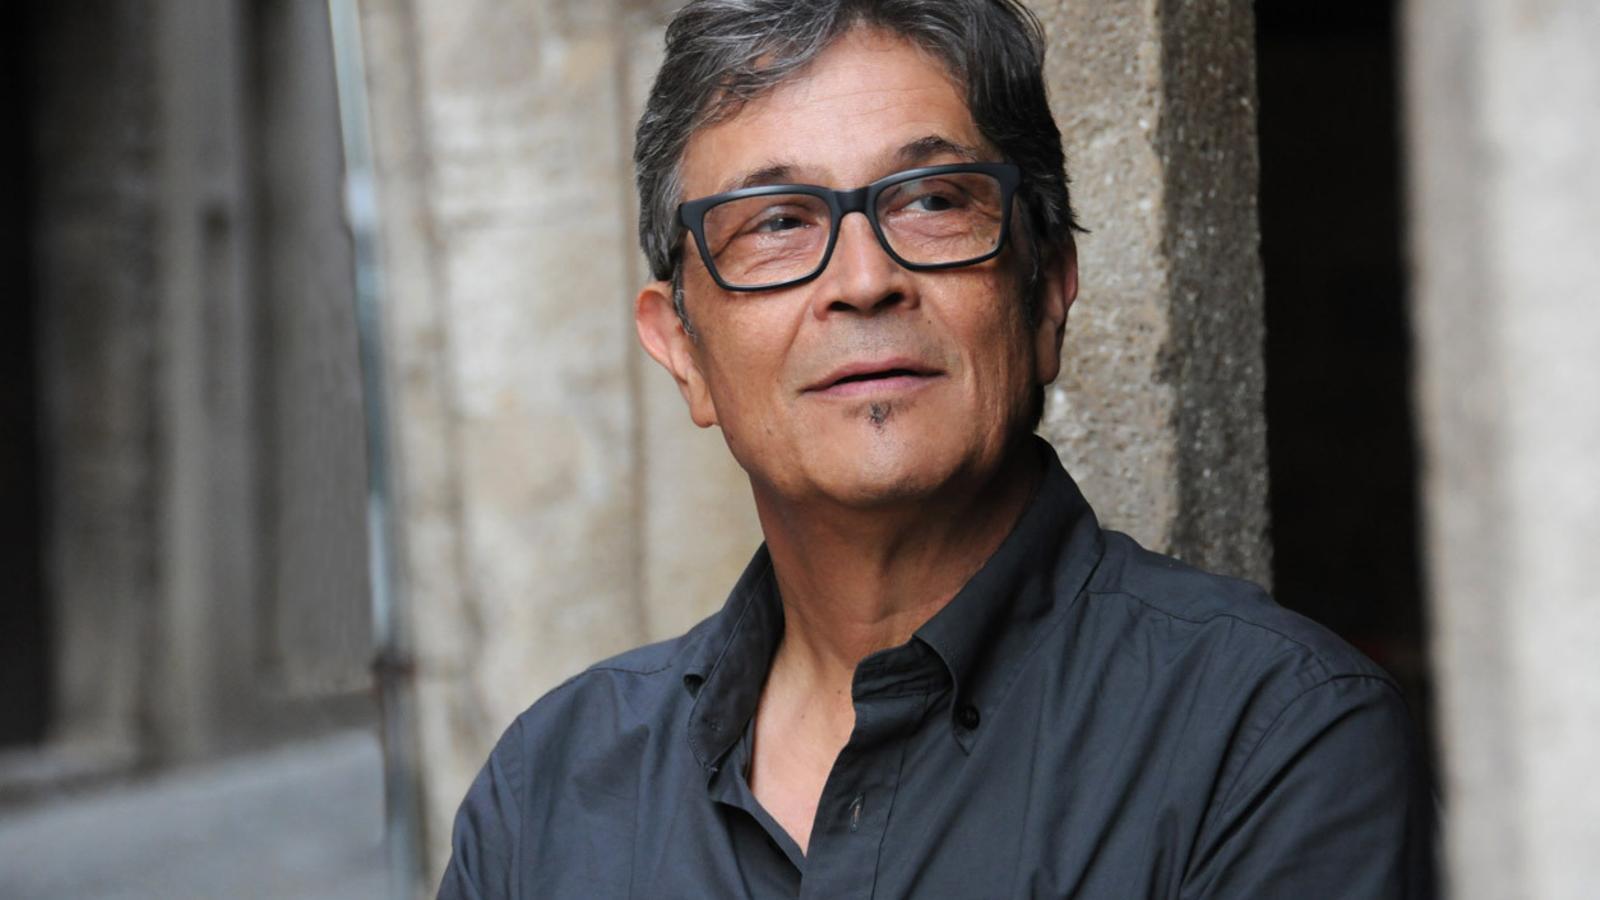 Chano Domínguez guanya el Premio Nacional de Músiques Actuals